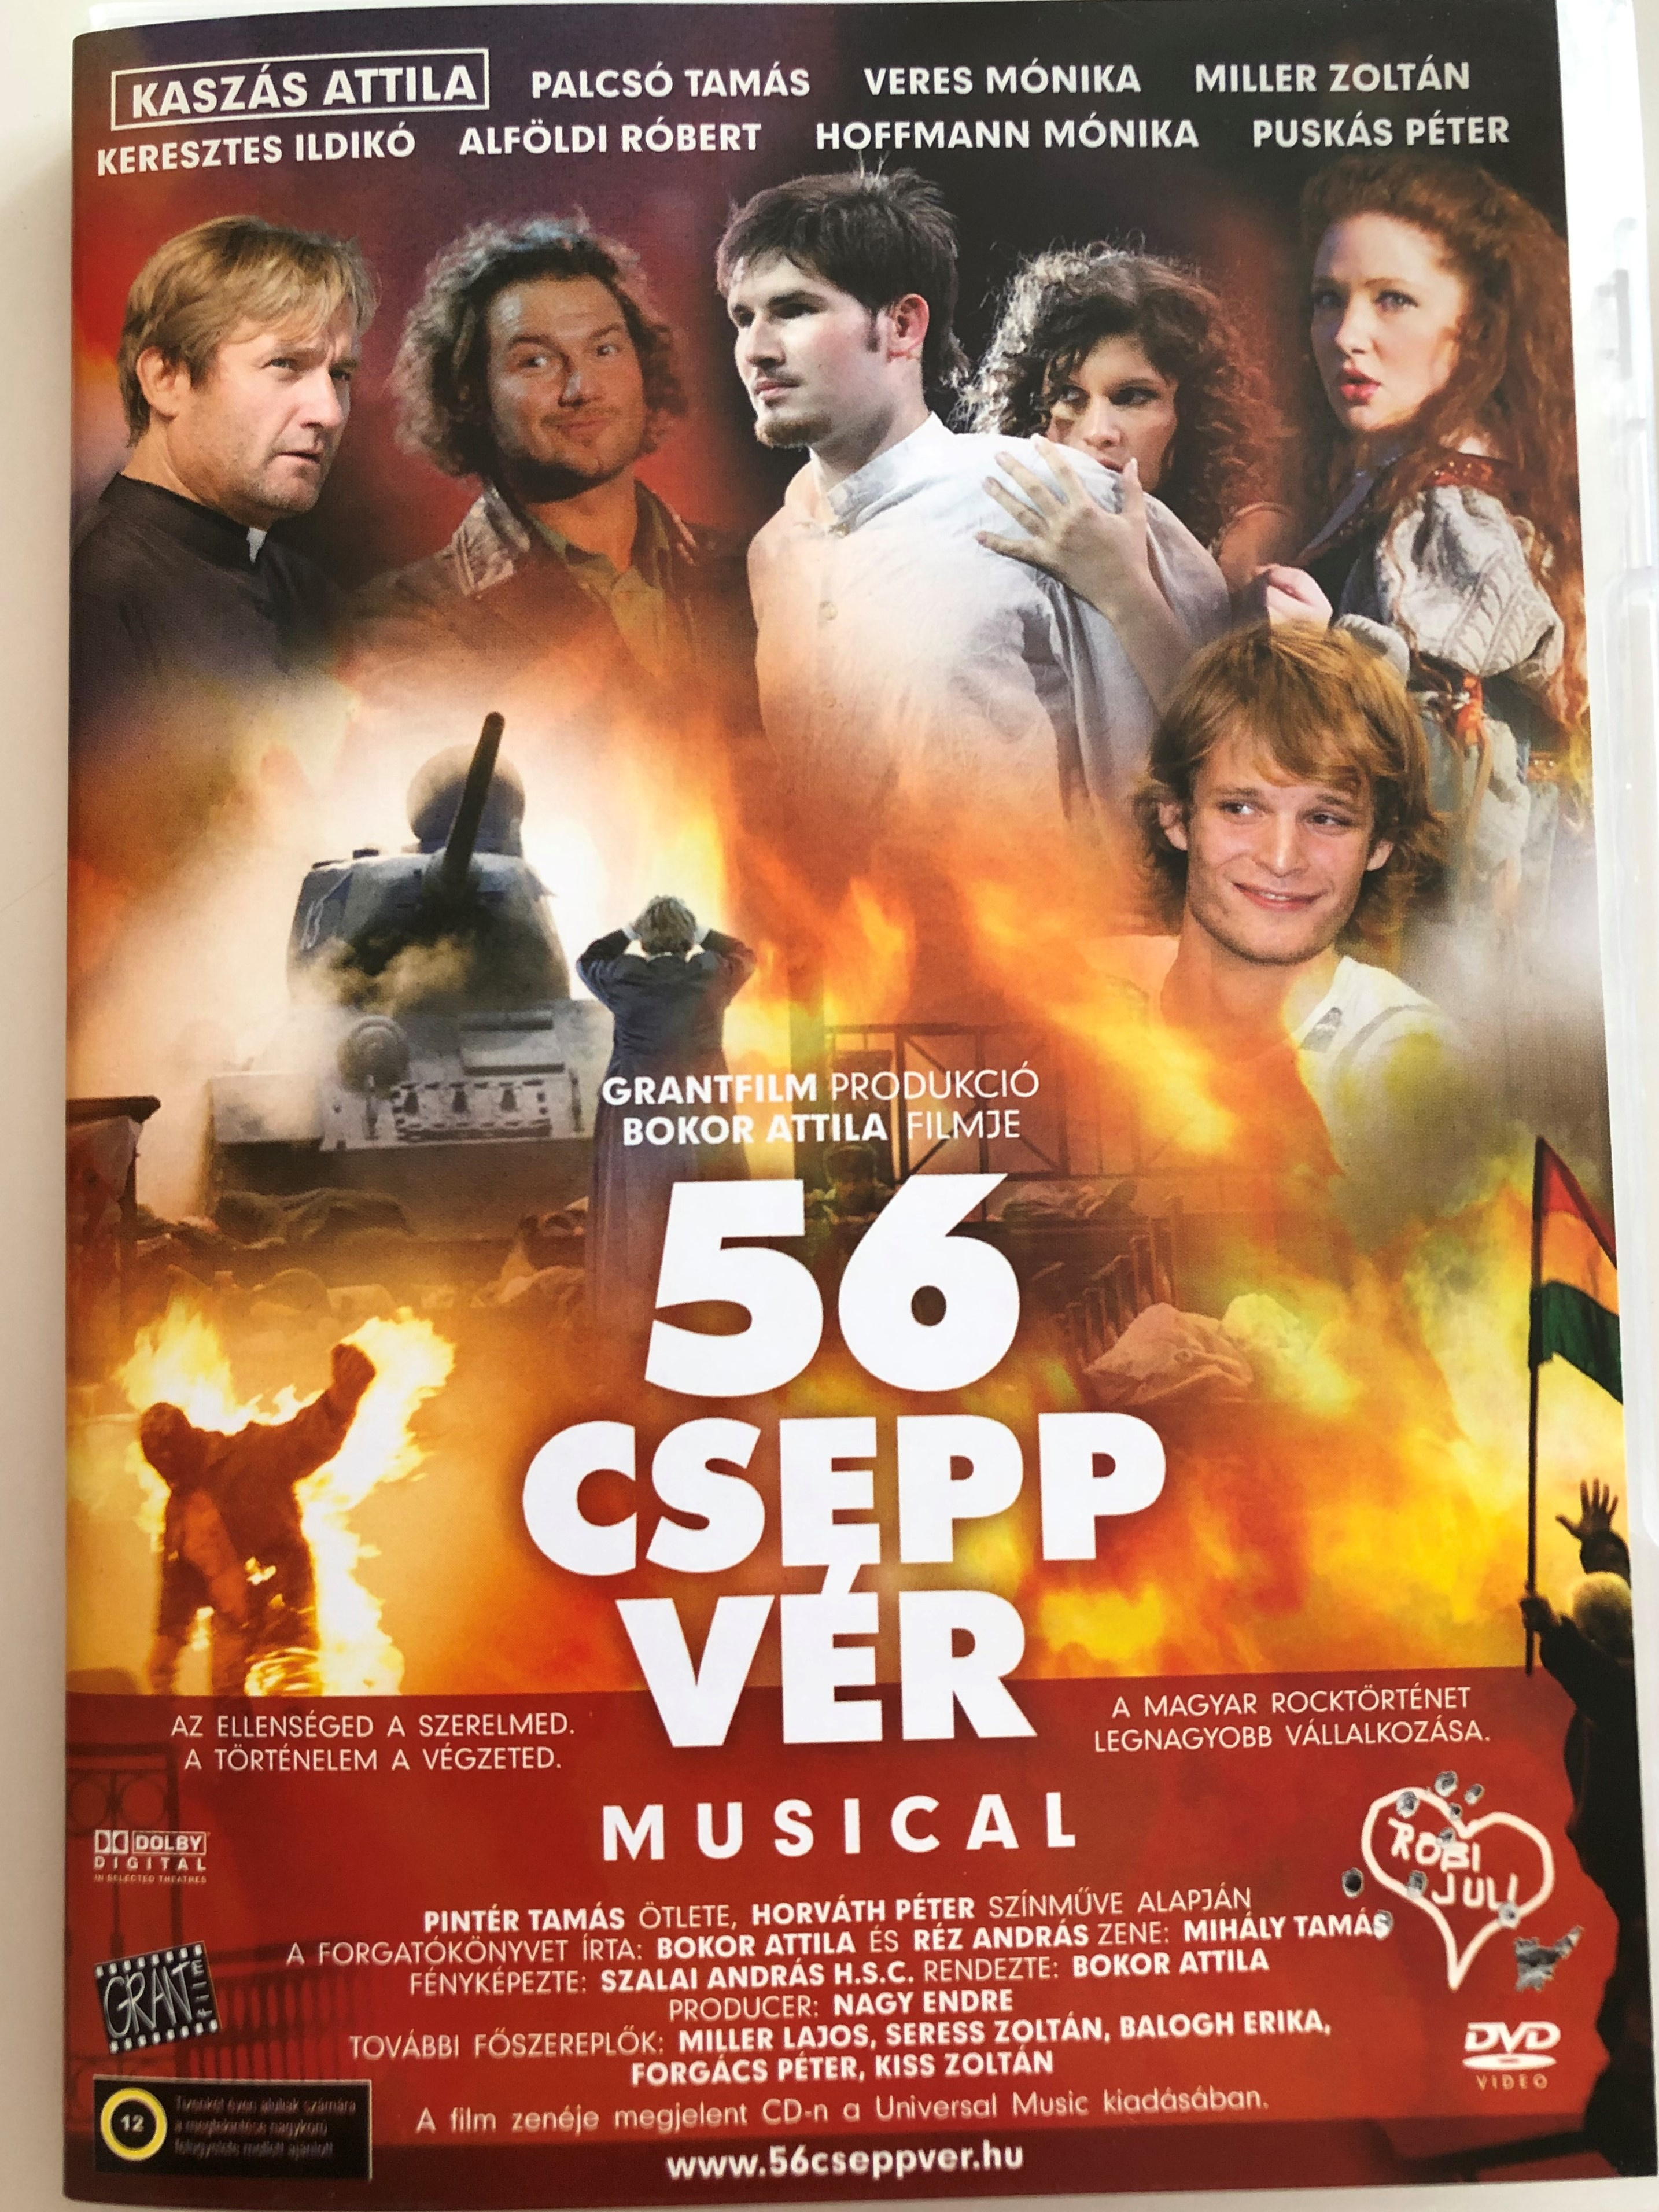 56-csepp-v-r-dvd-2006-56-drops-of-blood-directed-by-bokor-attila-starring-kasz-s-attila-palcs-tam-s-veres-m-nika-miller-zolt-n-keresztes-ildik-hoffmann-m-nika-forg-cs-p-ter-kiss-zolt-n-rock-musical-commemorating-th-1-.jpg